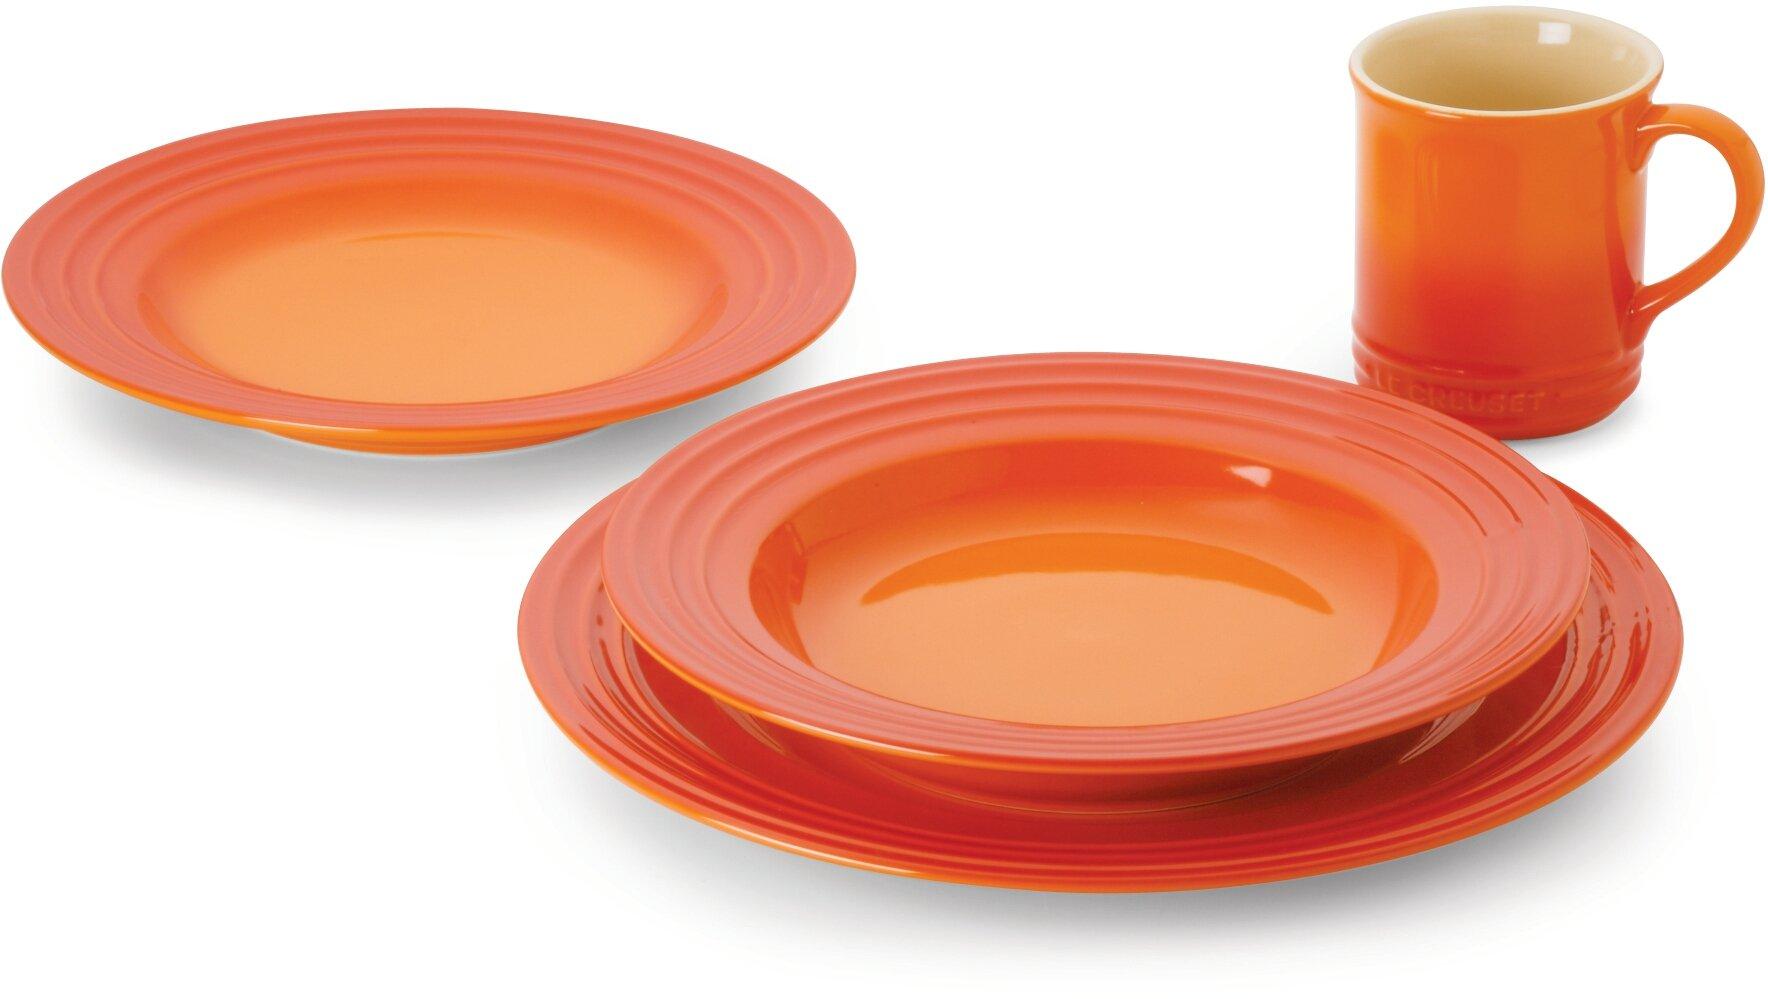 Le Creuset Stoneware 16-Piece Dinnerware Set, Flame